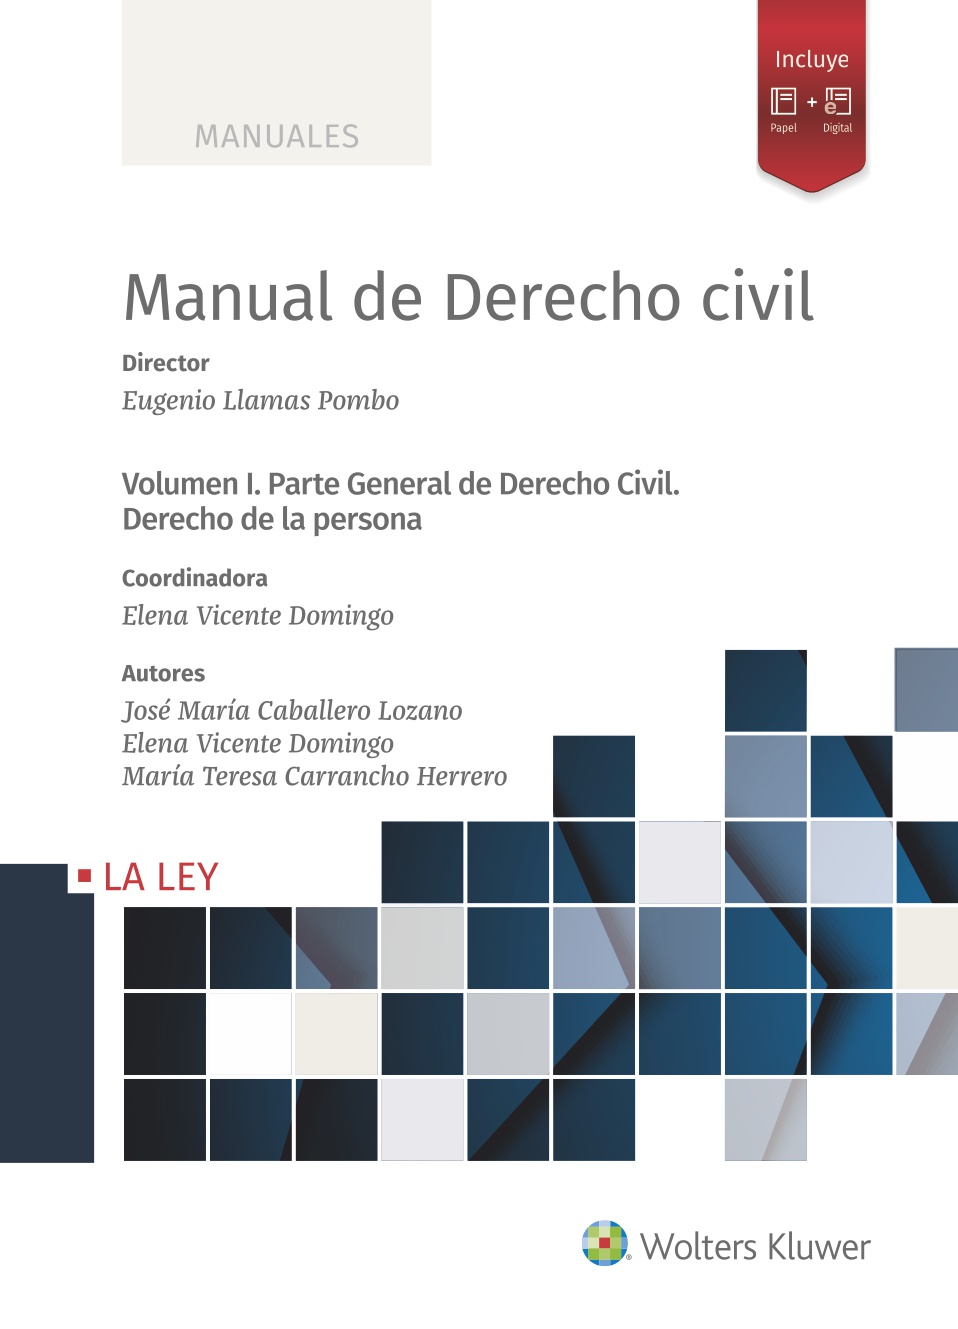 Manual de Derecho Civil   «Volumen I. Parte General de Derecho Civil. Derecho de la persona»